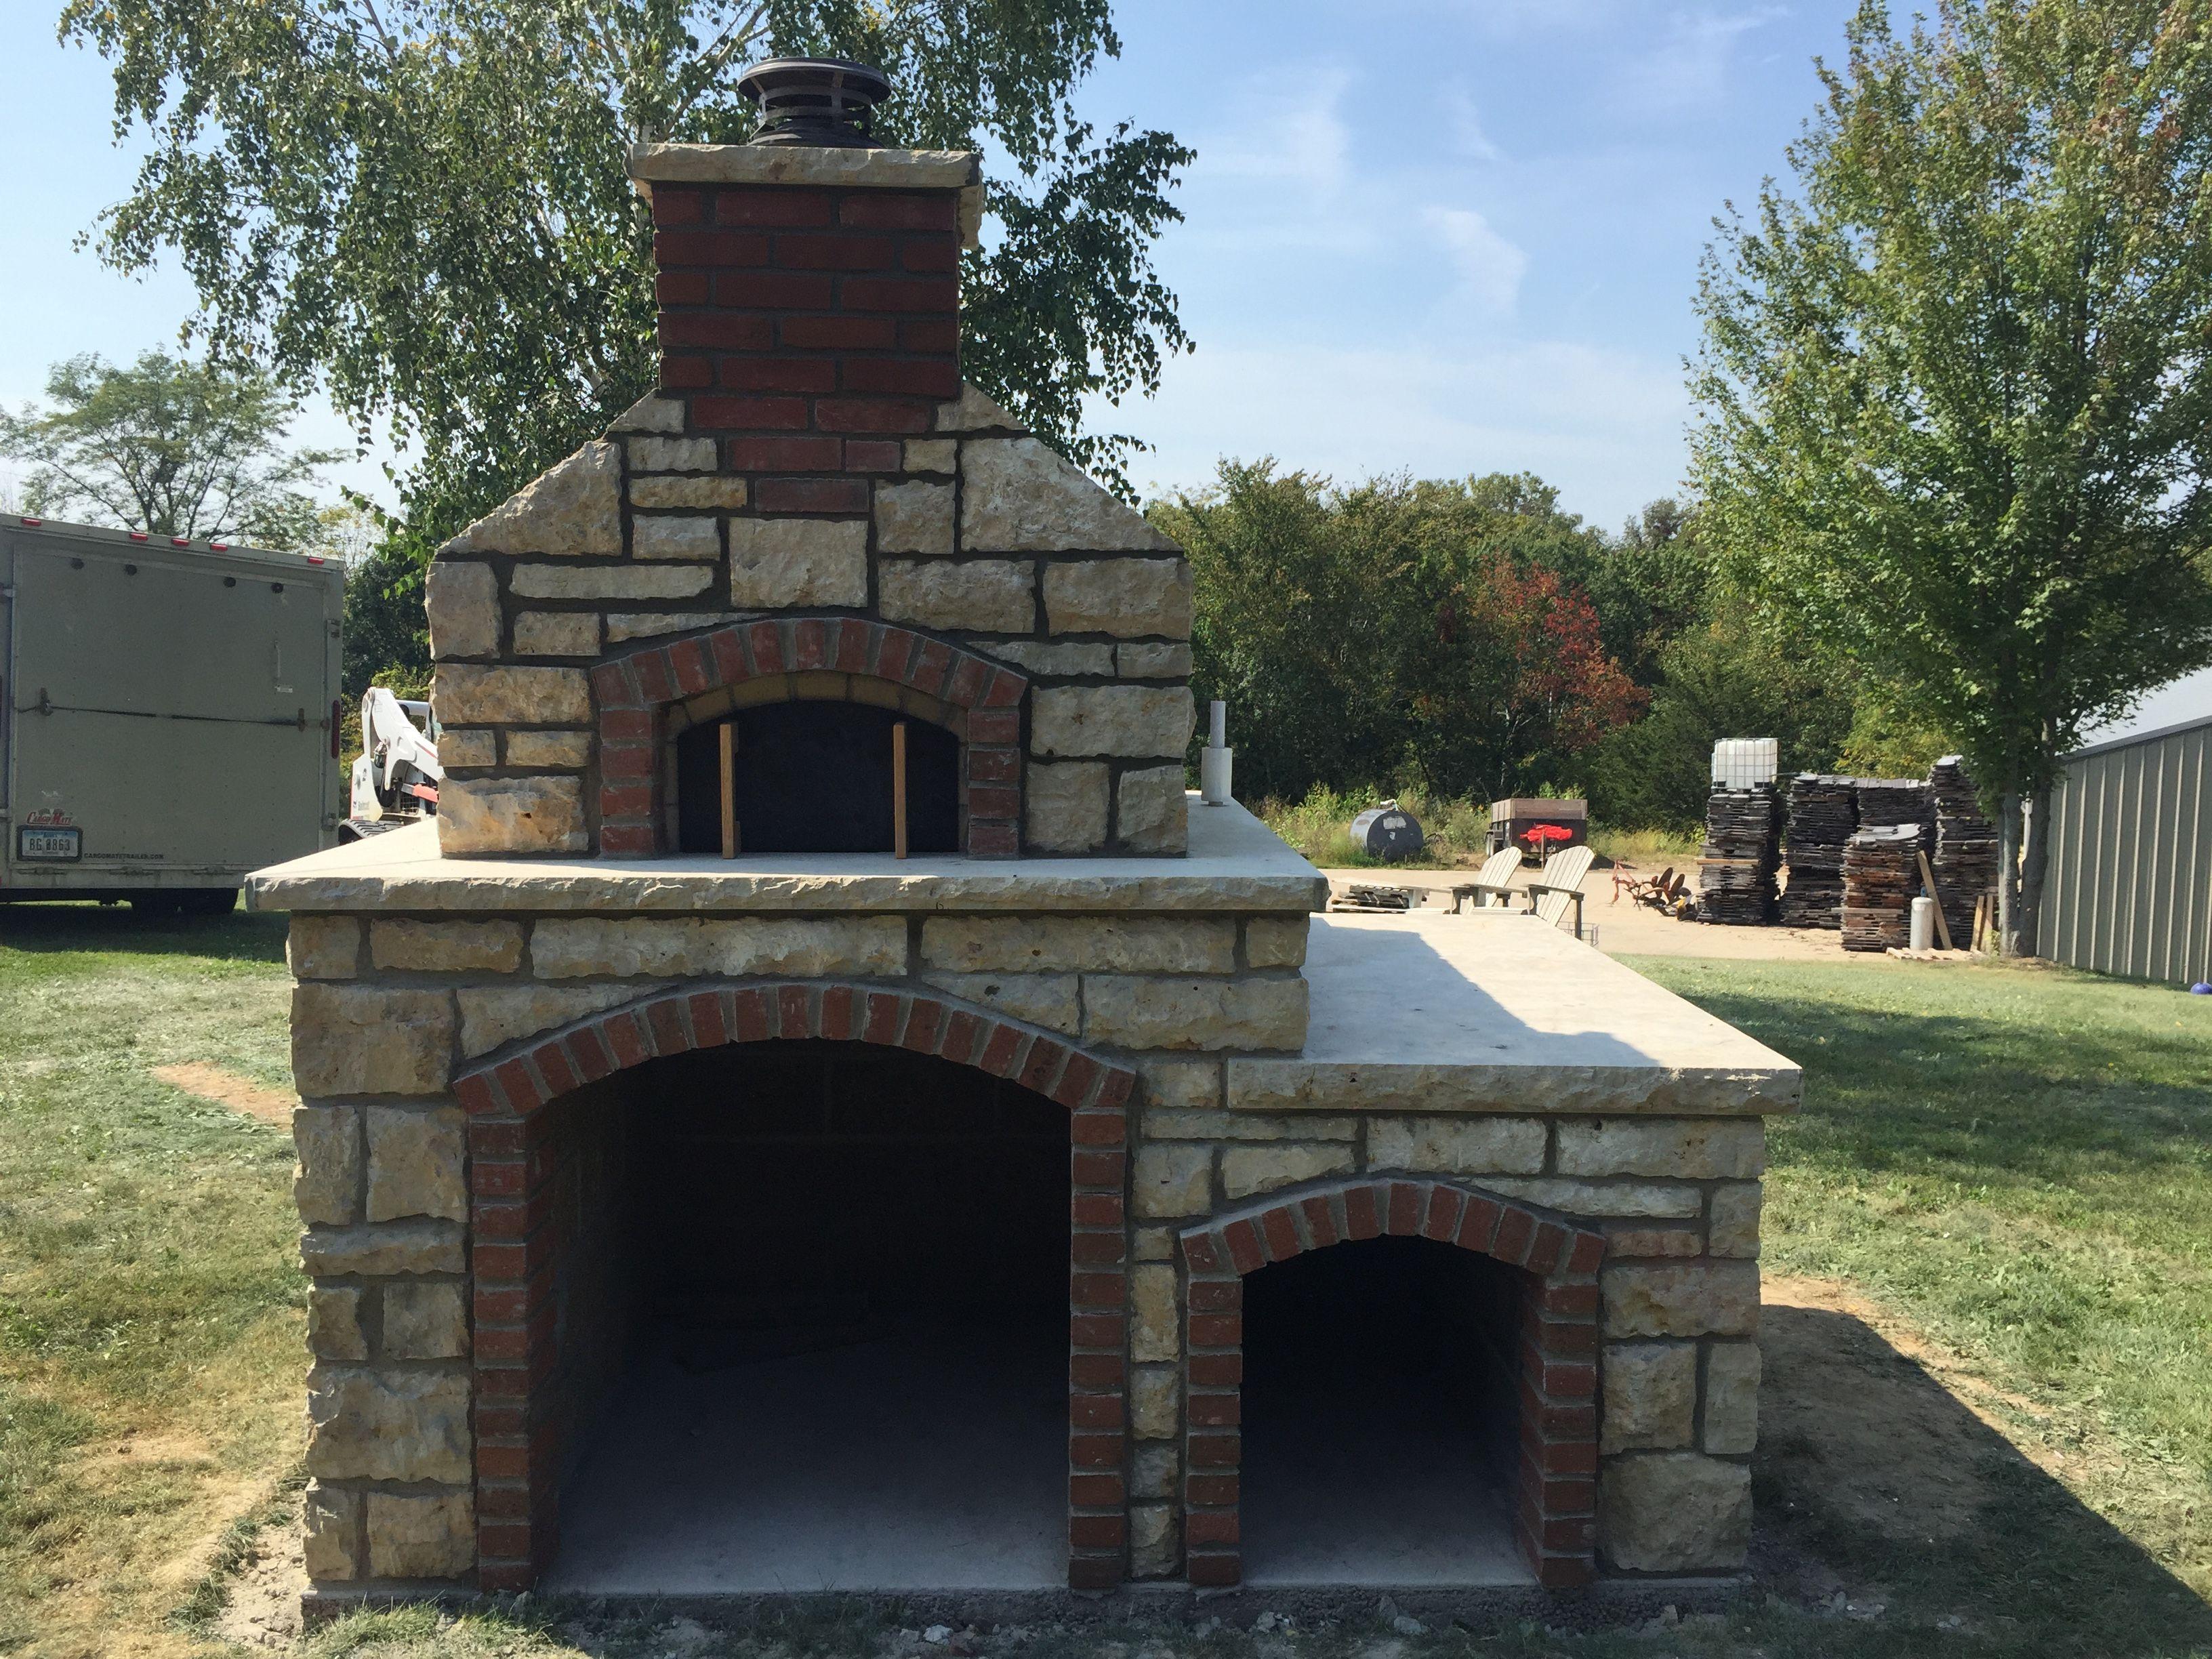 Brick pizza oven schwartz brick pizza oven pizza oven